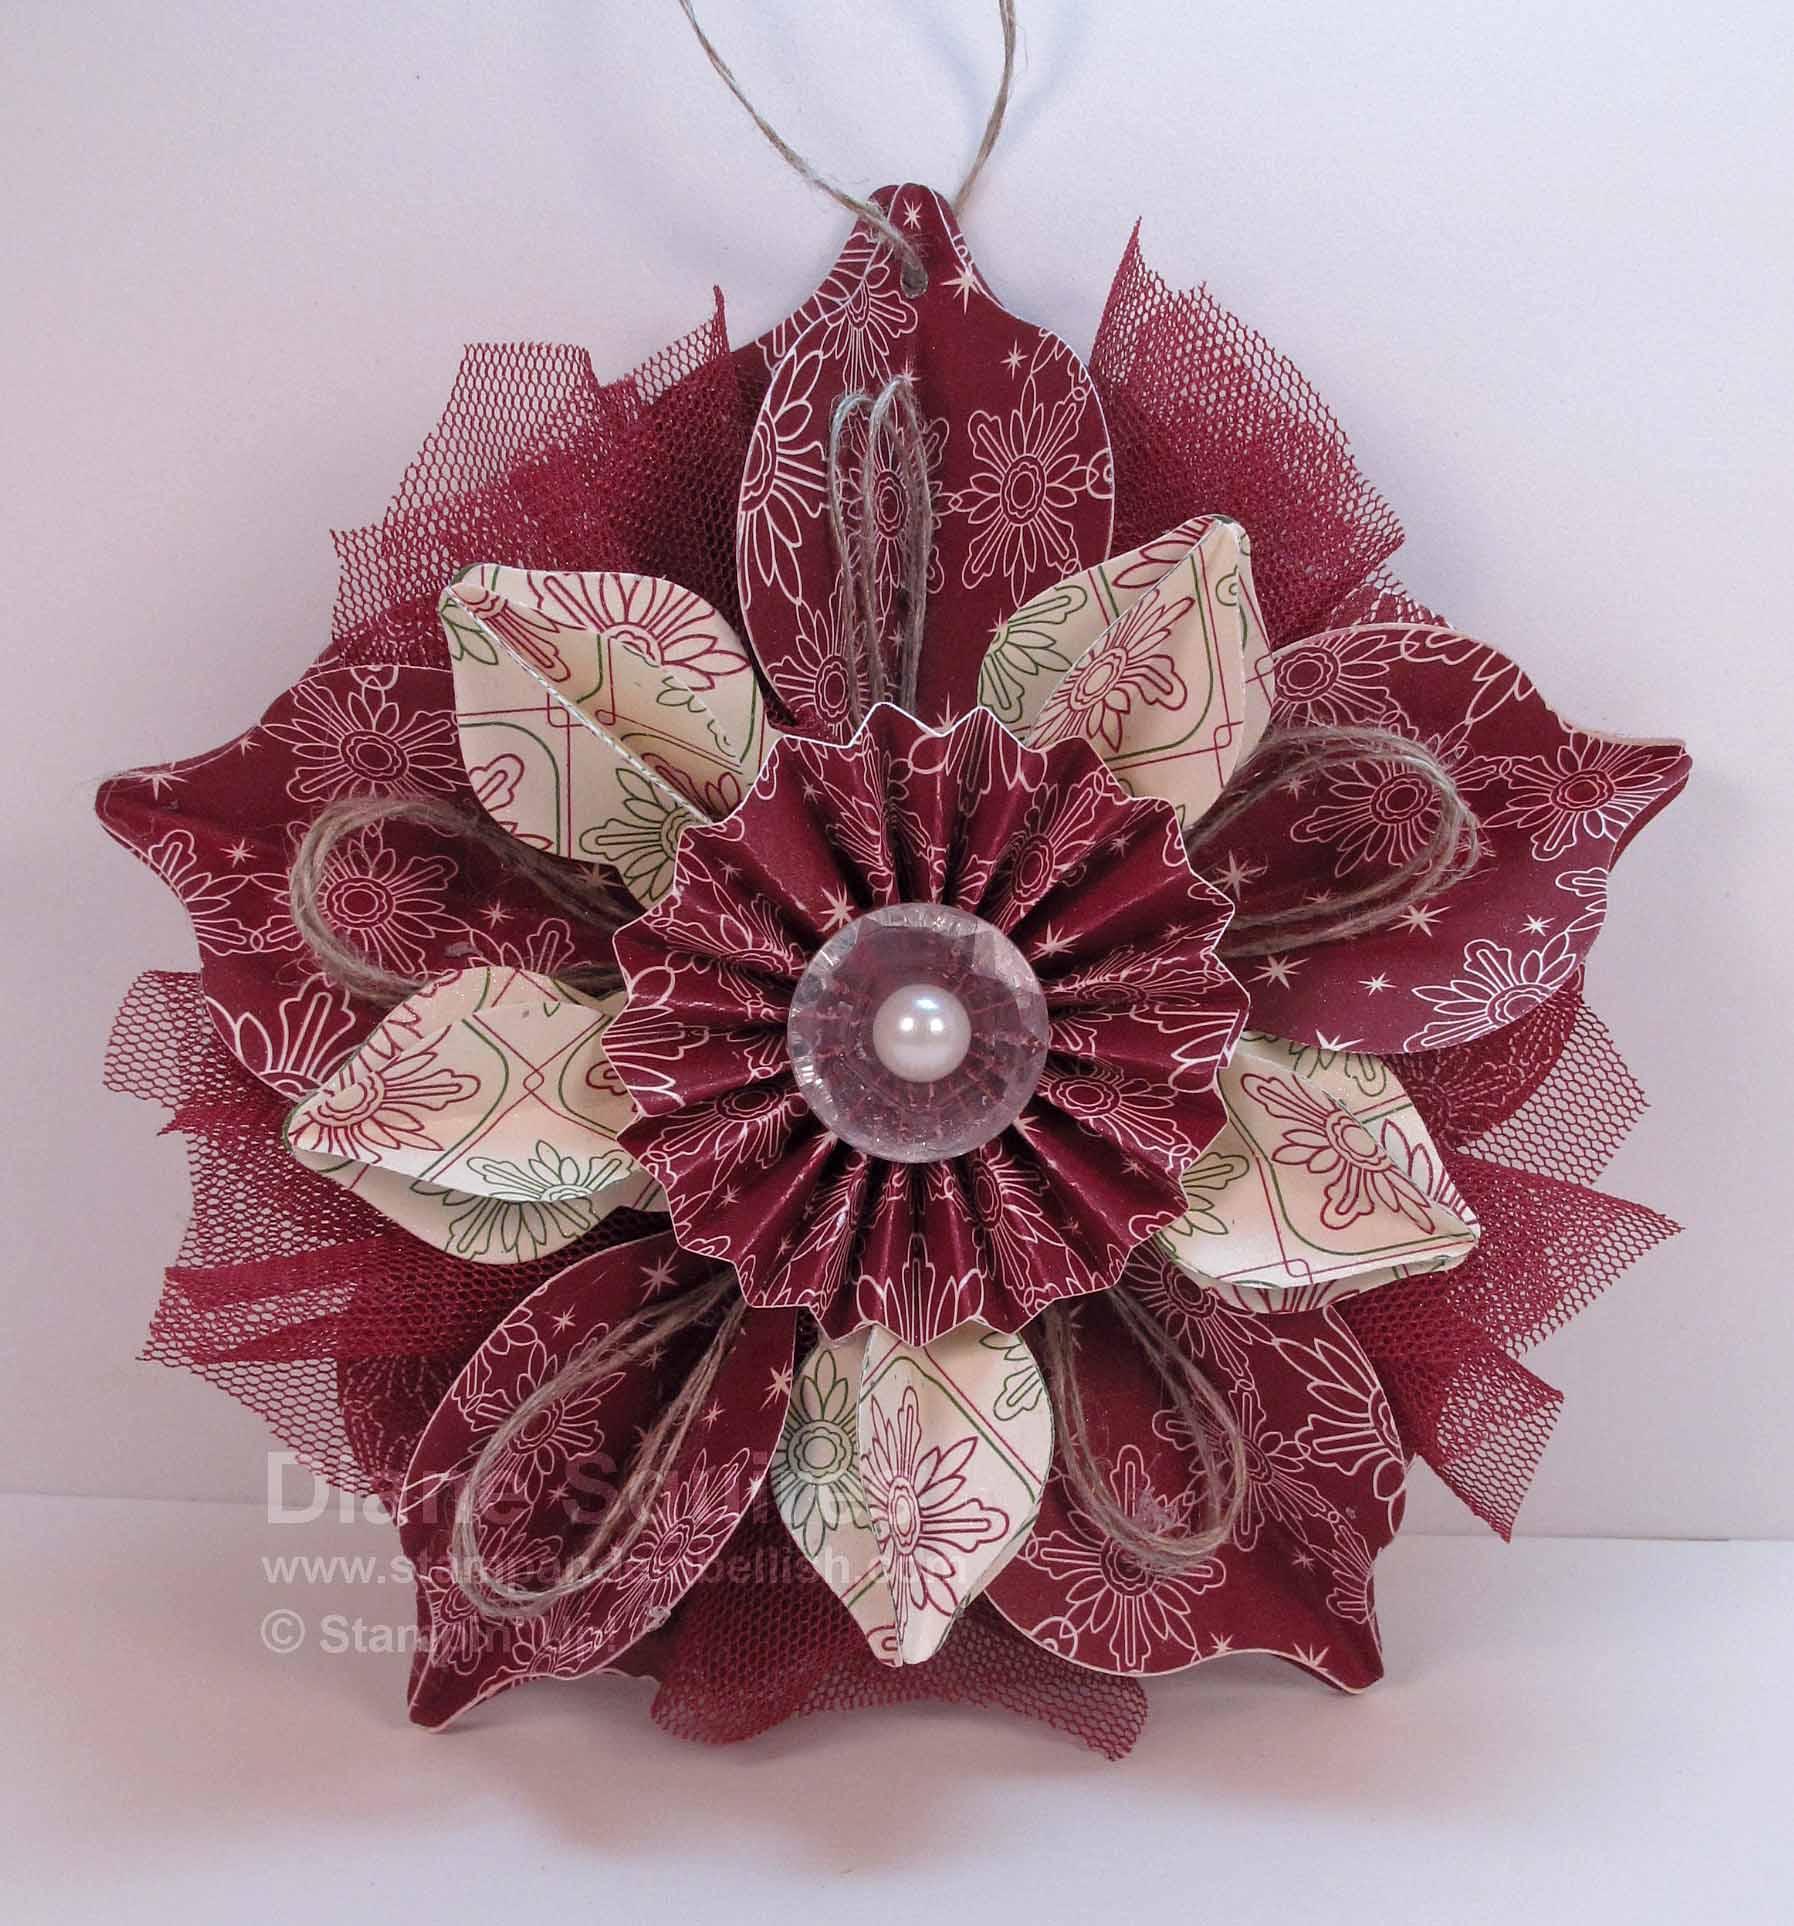 Handmade Christmas Ornament Stamp Embellish